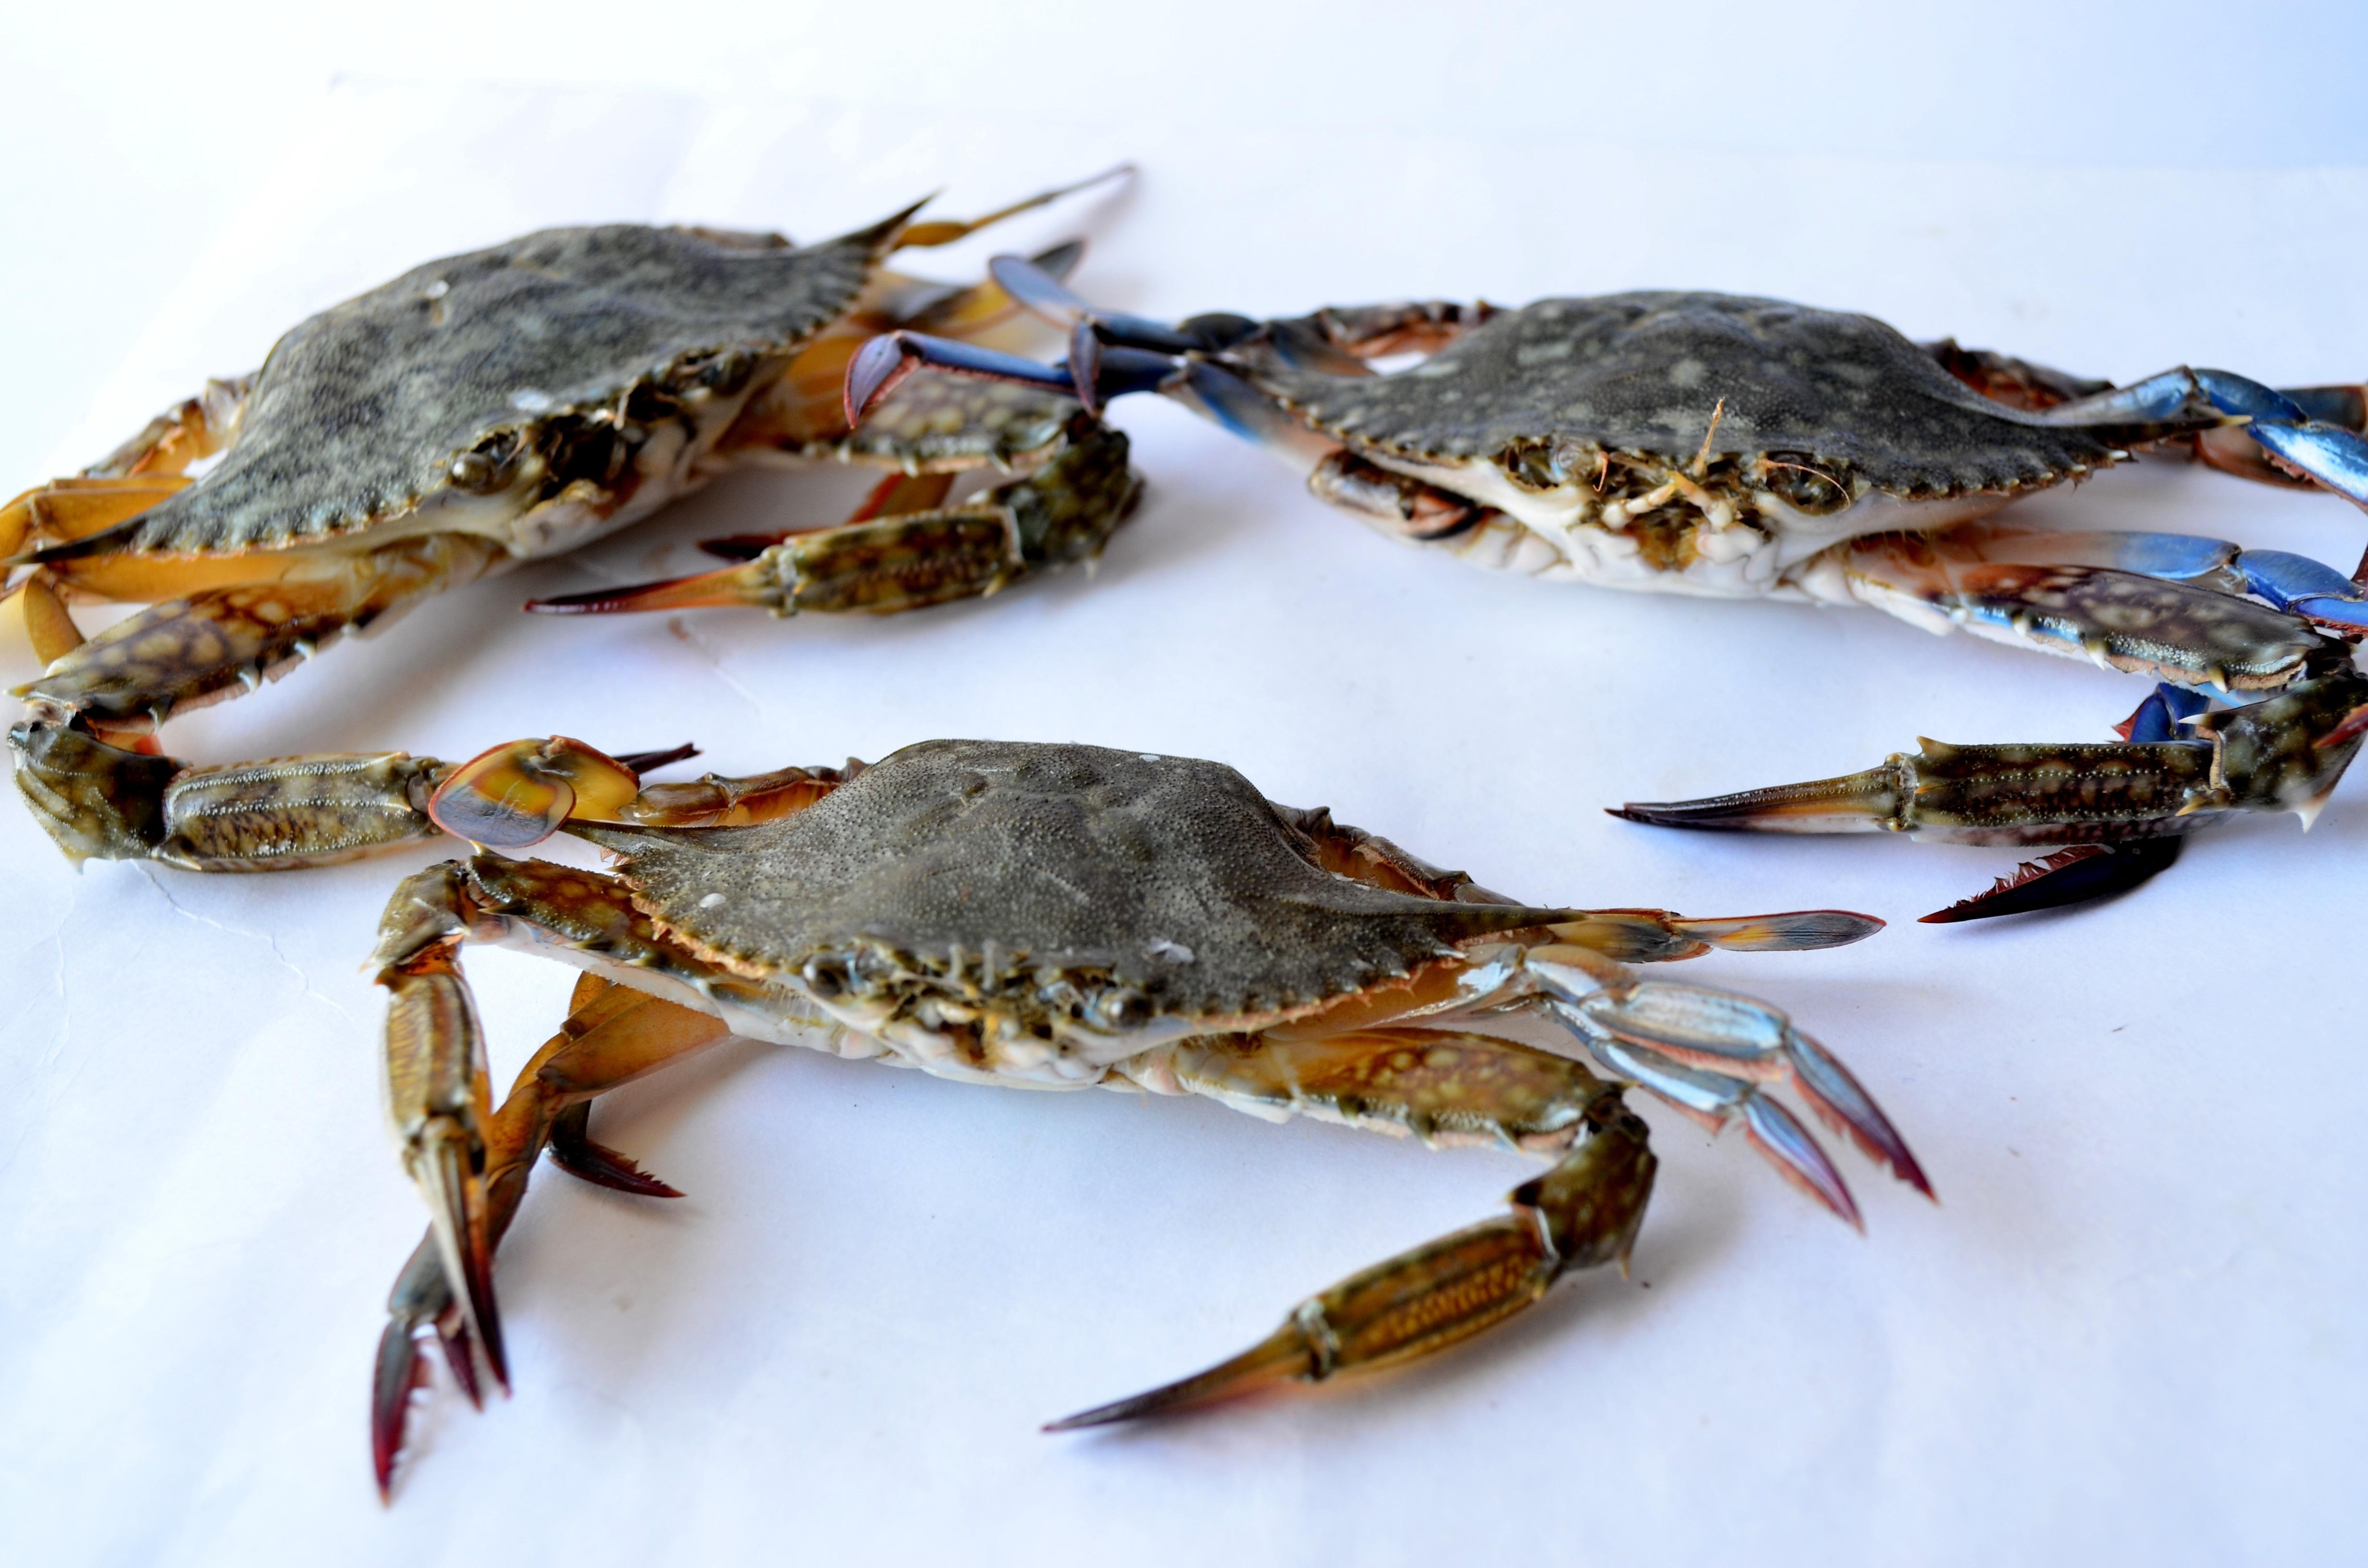 Free images seafood fresh aquatic fish gourmet for Blue crab fishing